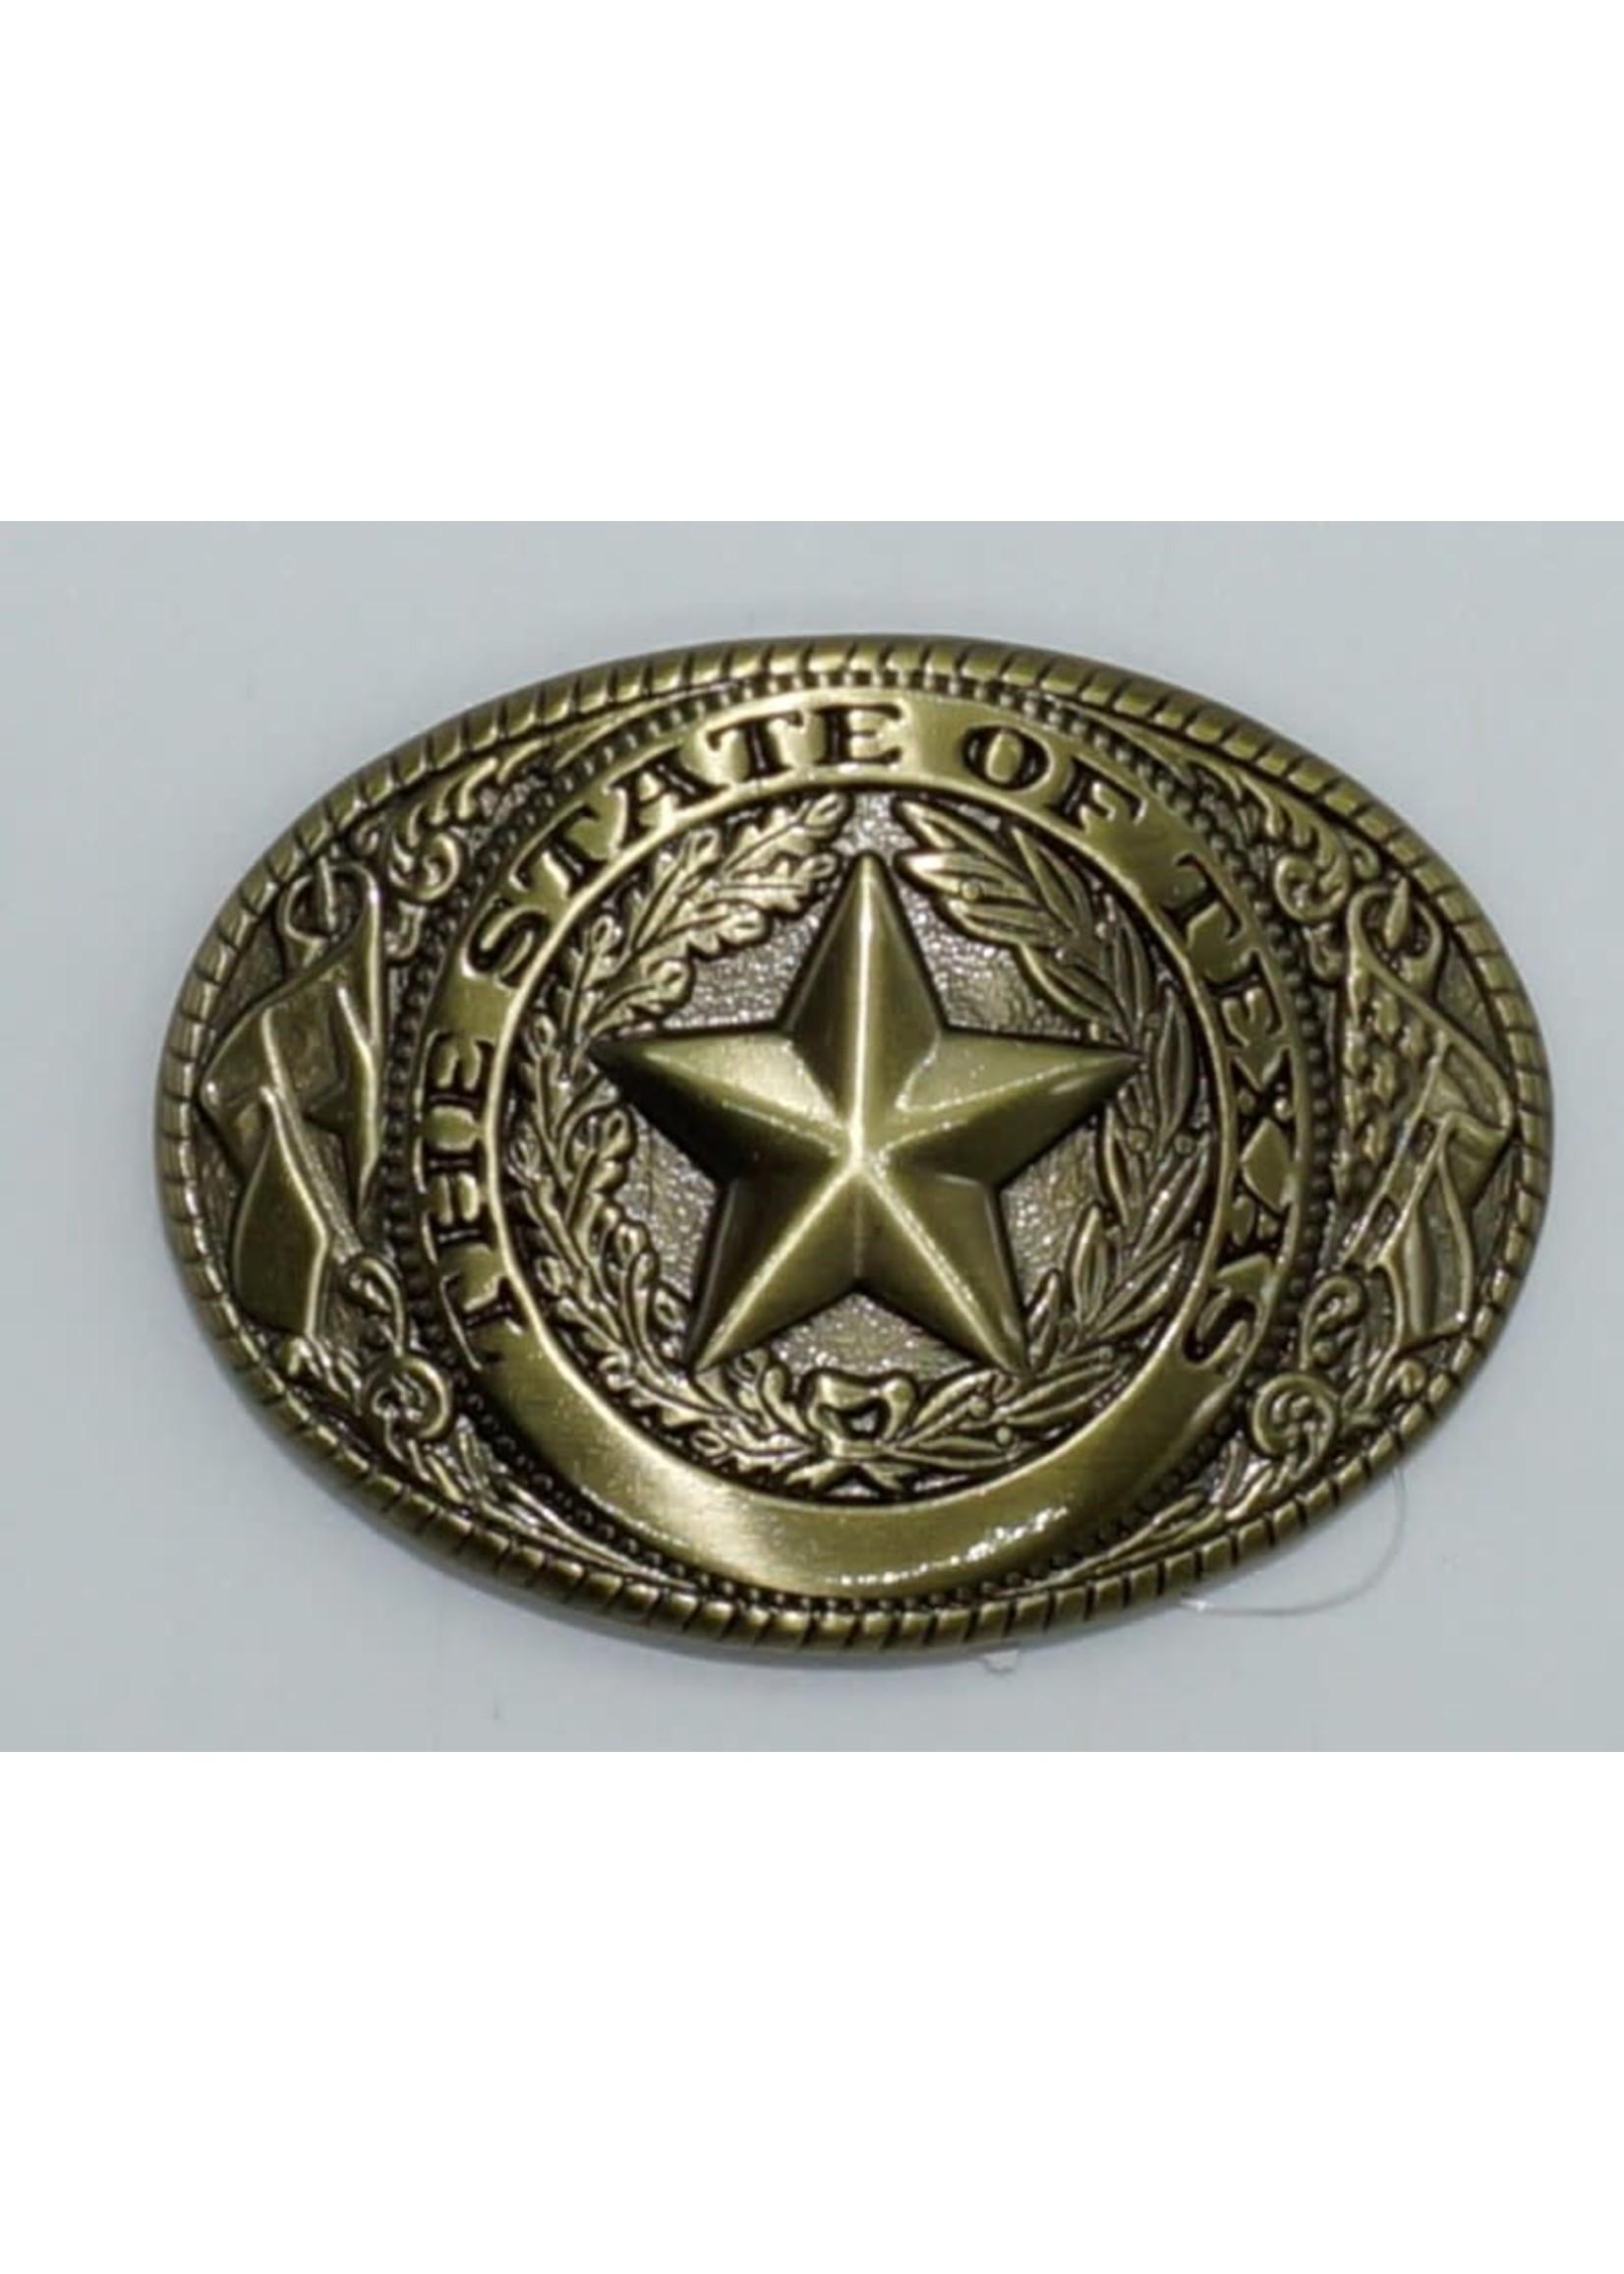 M&F 37002-Rope Edge Texas Seal Brass